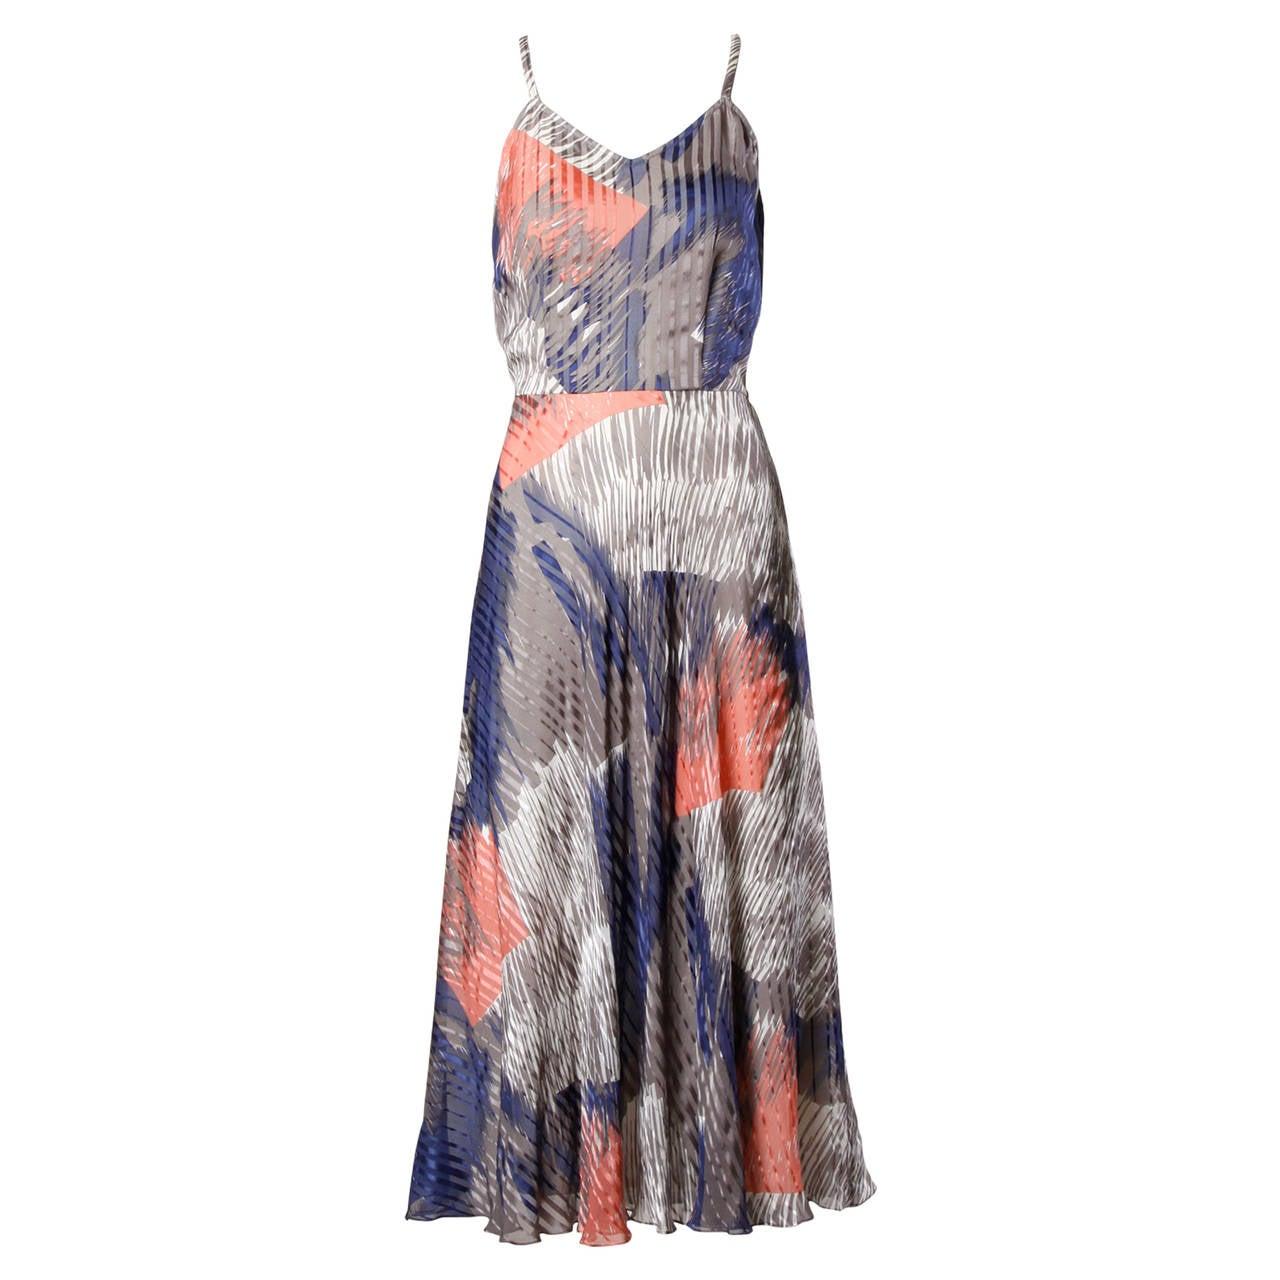 Vintage Sheer Printed Silk Chiffon Dress 1